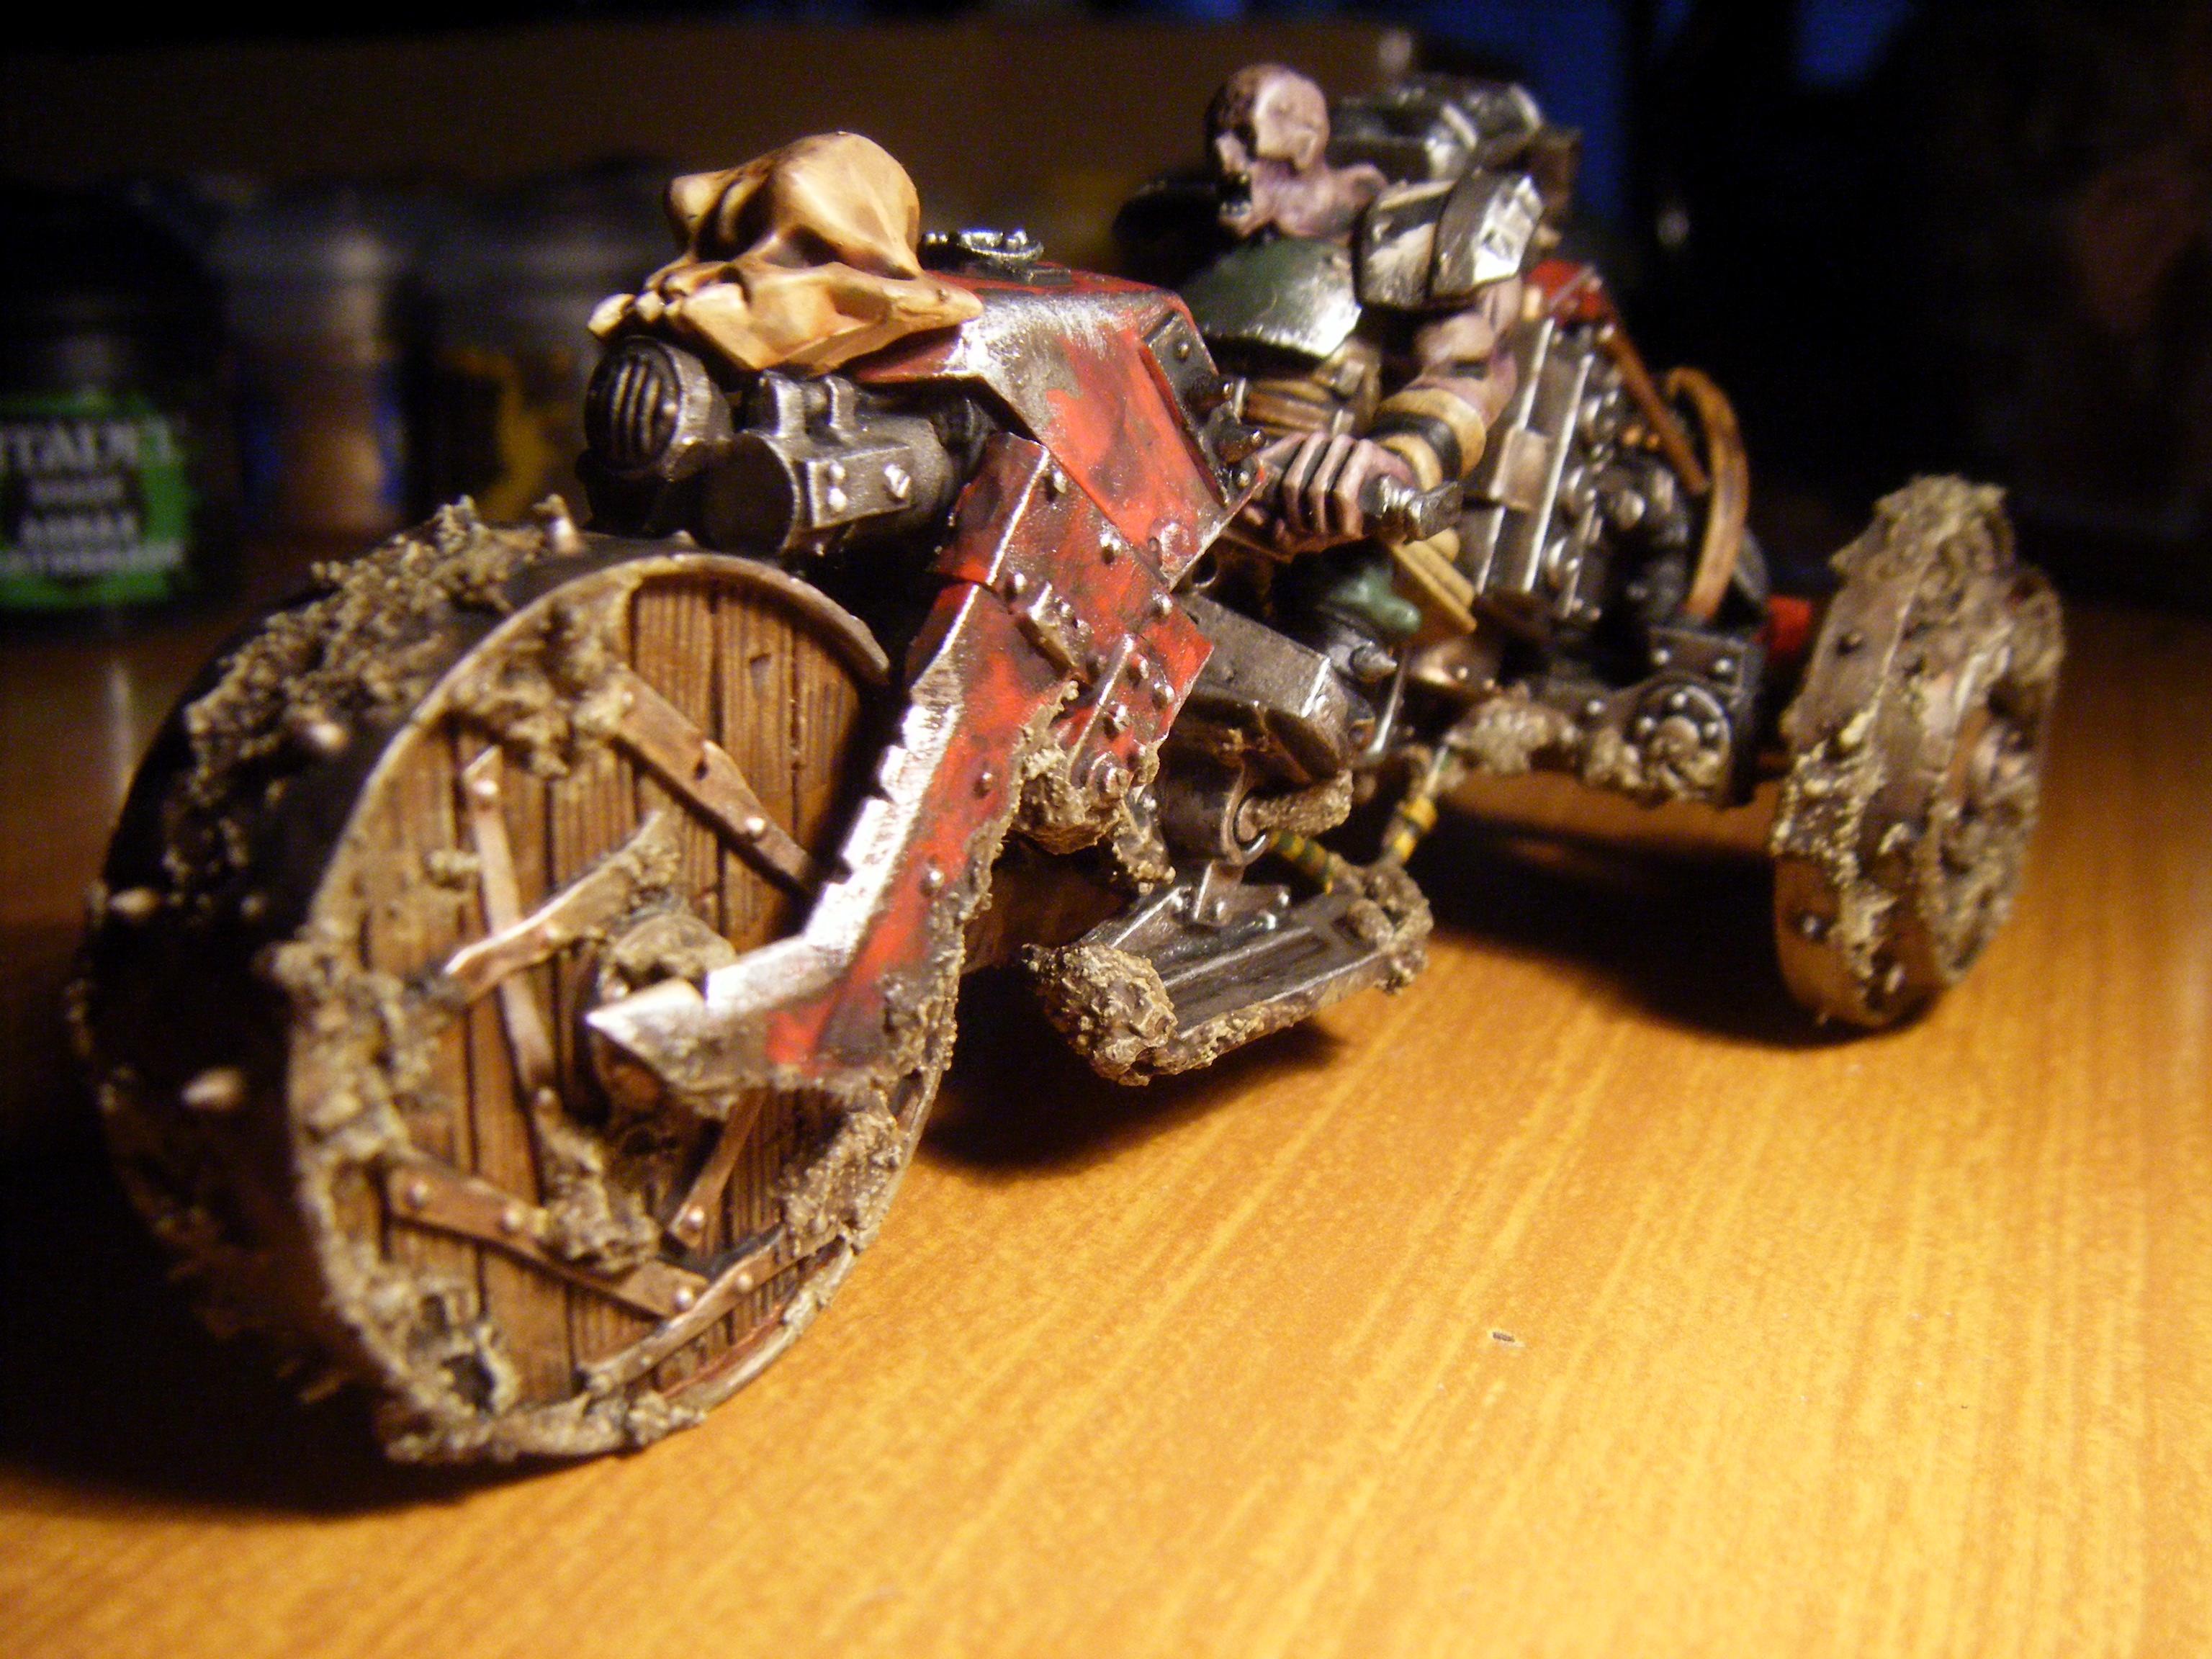 Motorcycle, Steampunk, Wood, Zombie